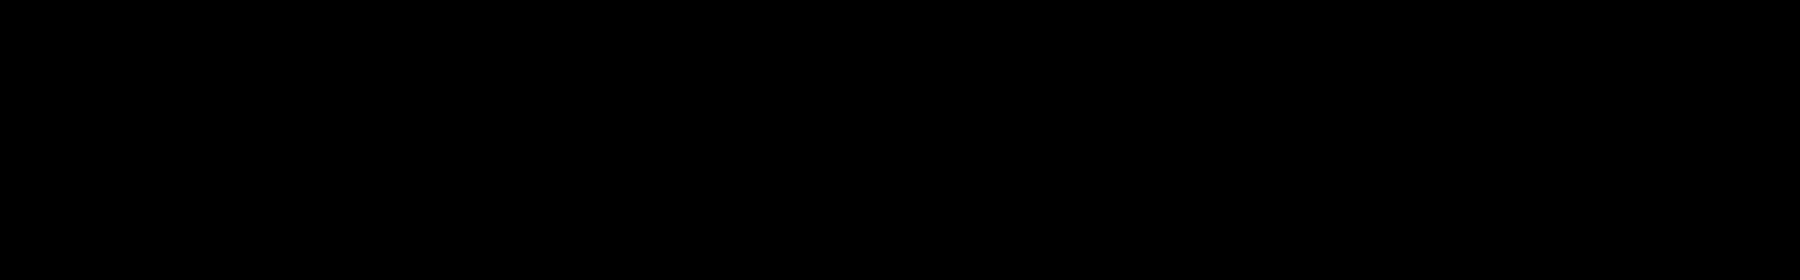 Tone Dragon audio waveform